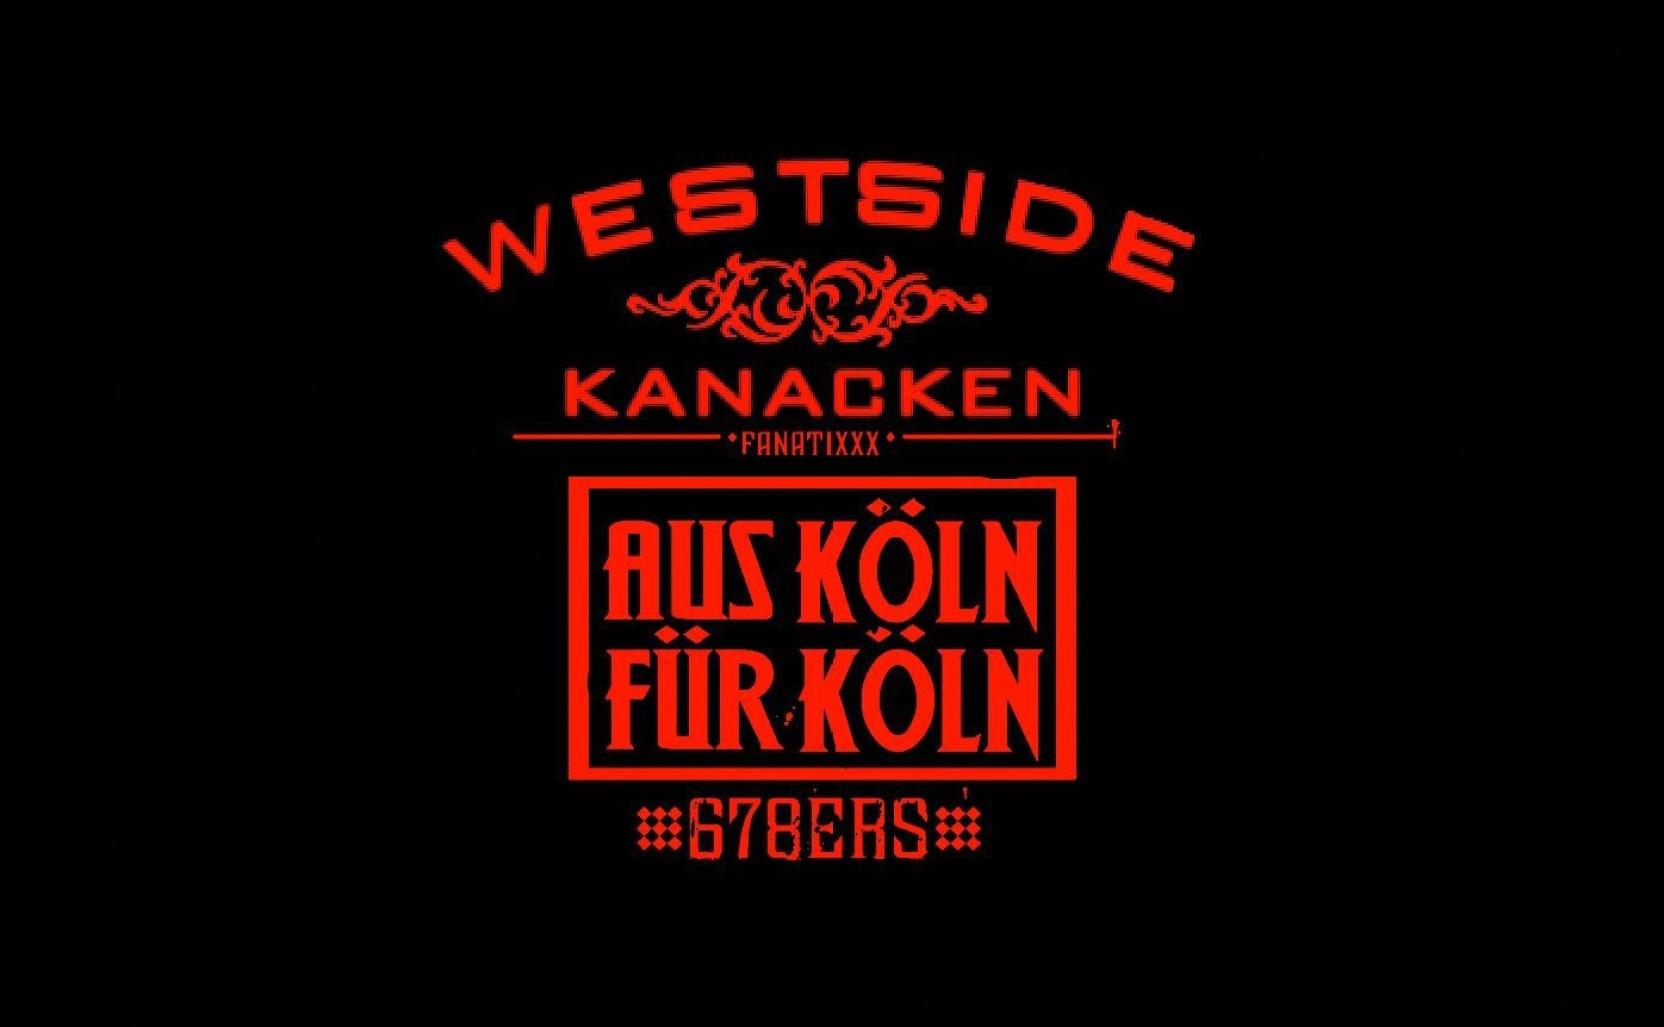 Music Rap Deutsche Rap Westside Kanacken Massakah And Ghanone 1664x1027